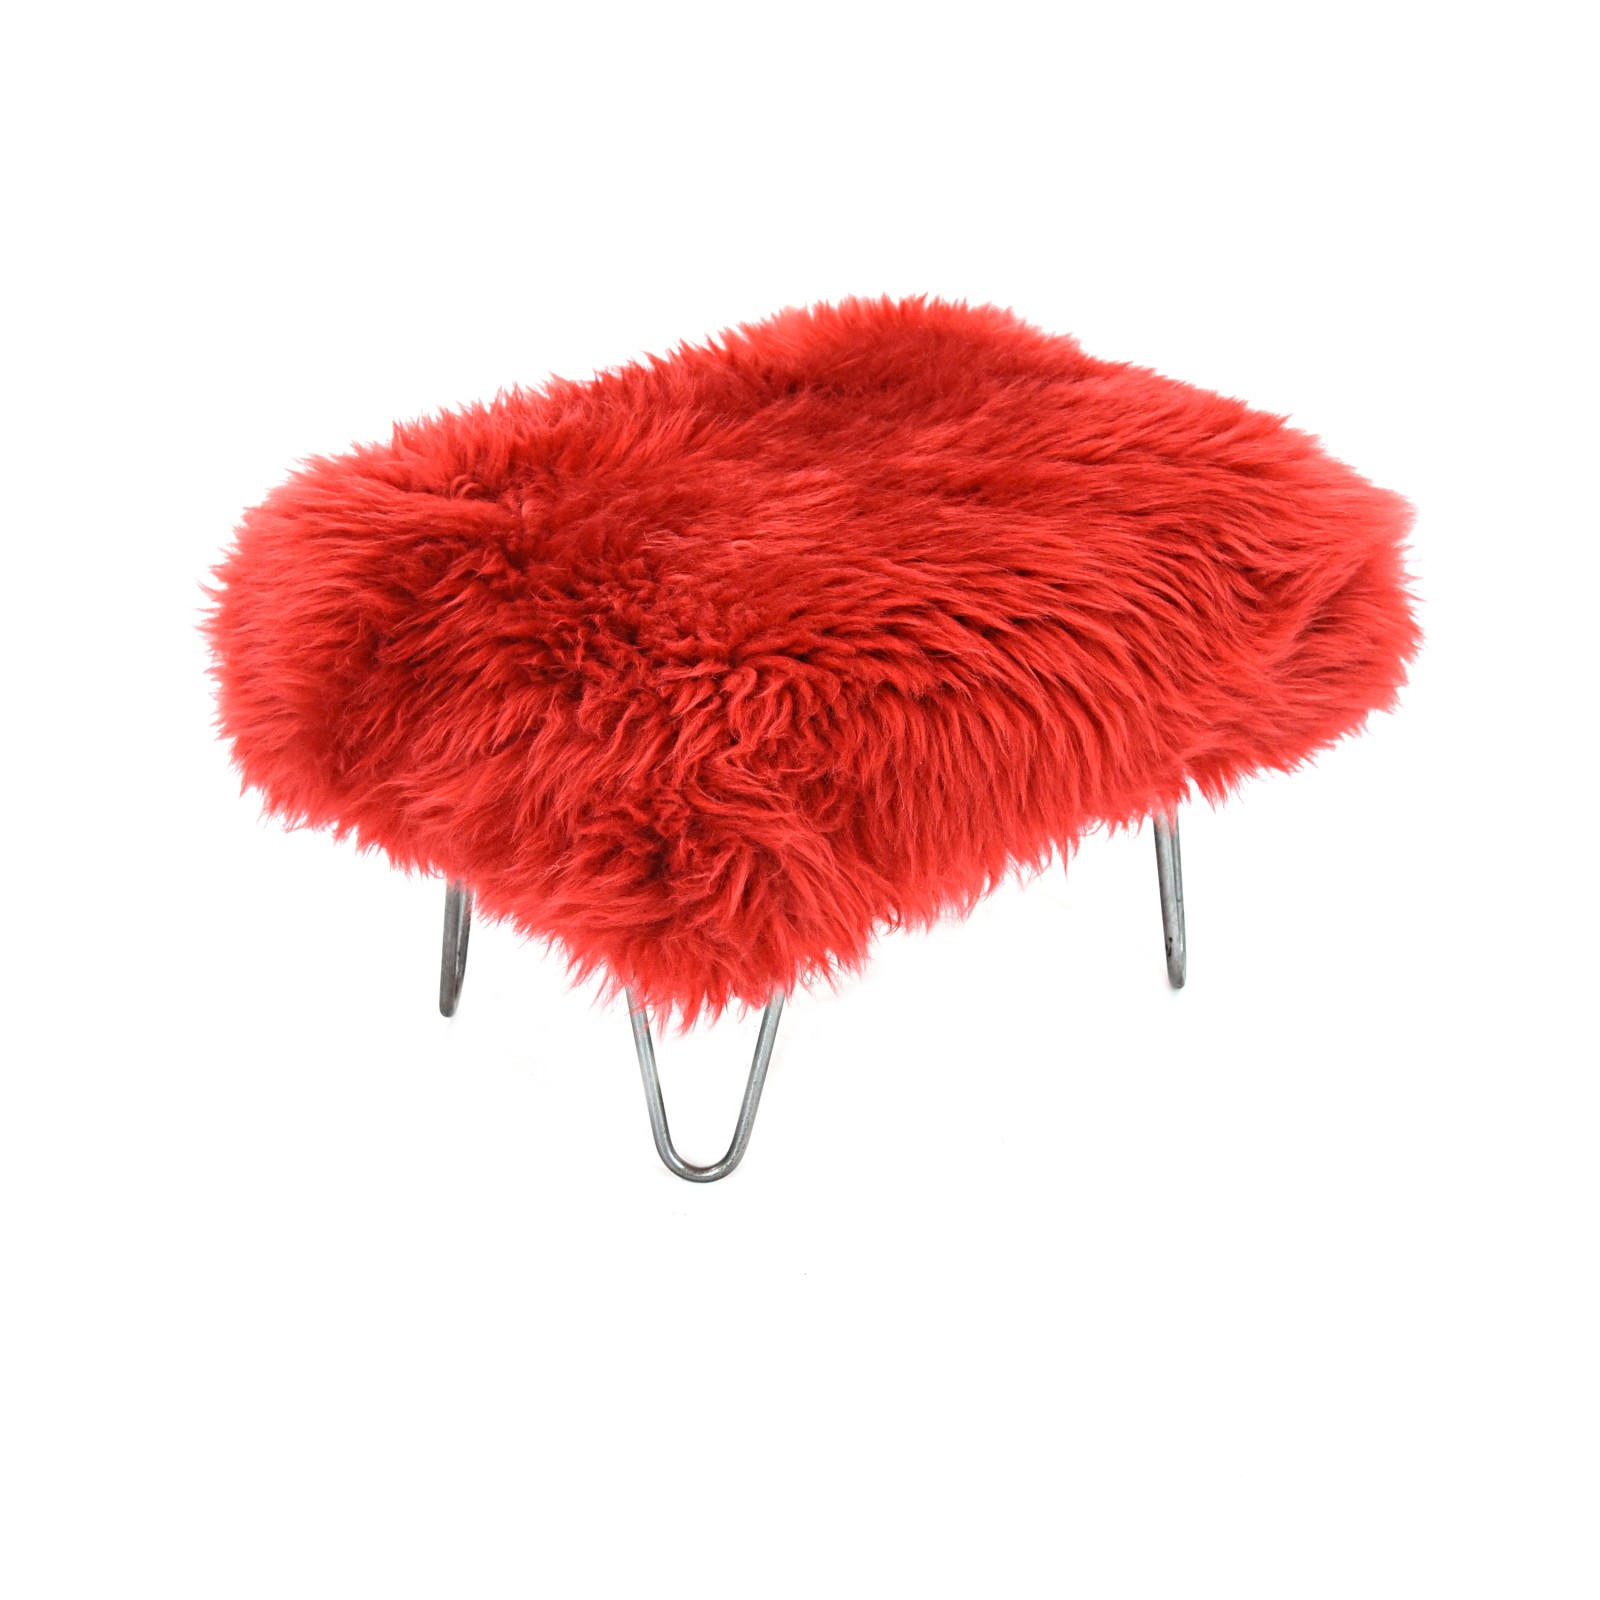 Sara - Sheepskin Footstool Dragon Red